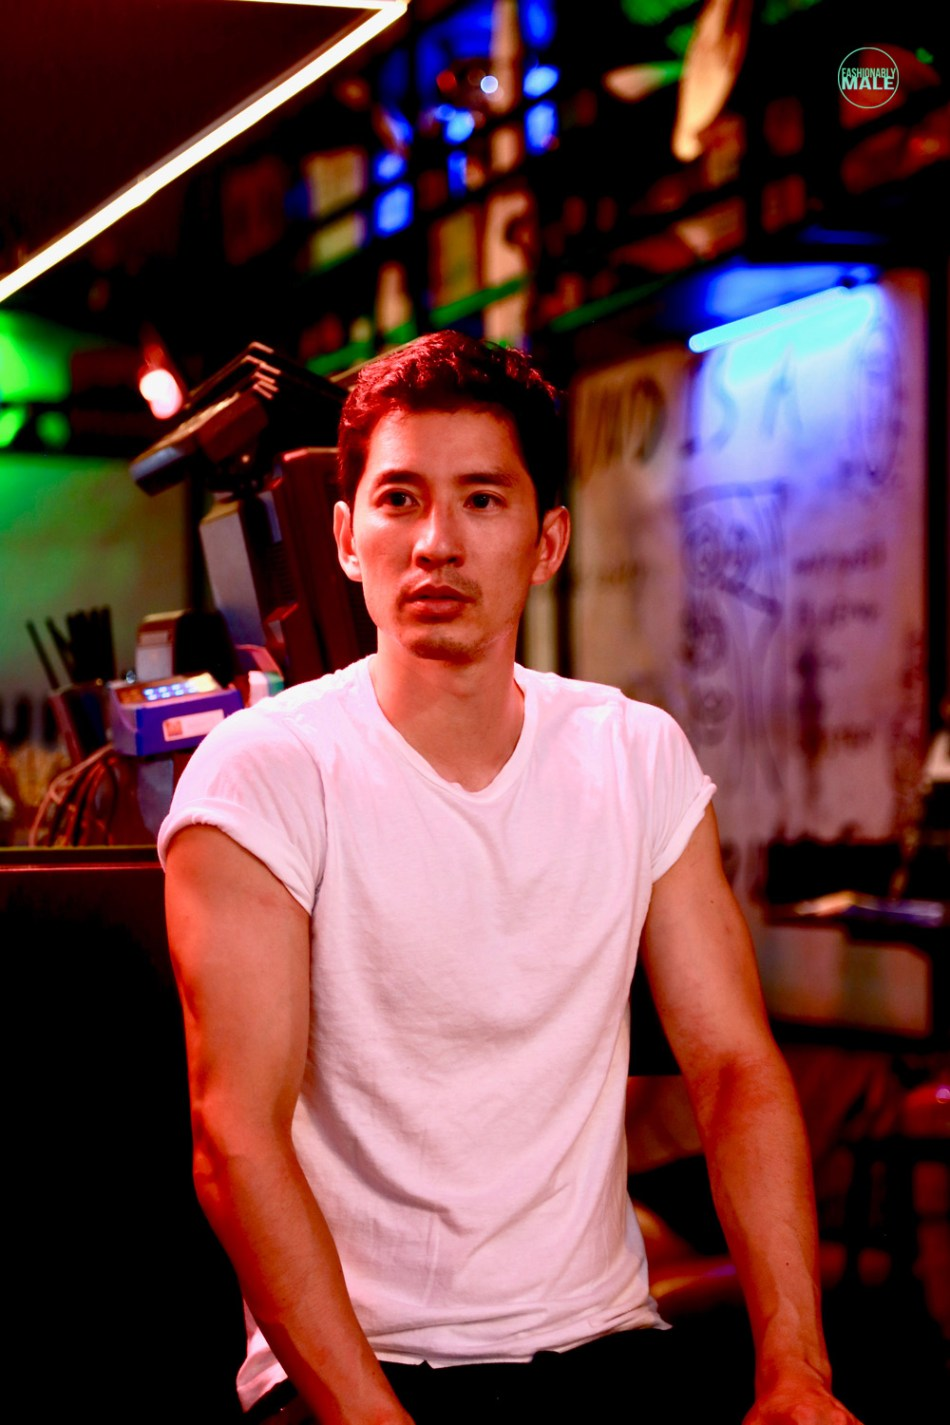 The Night Watchman Richie Kul by Wendy Loke for Fashionably Male8